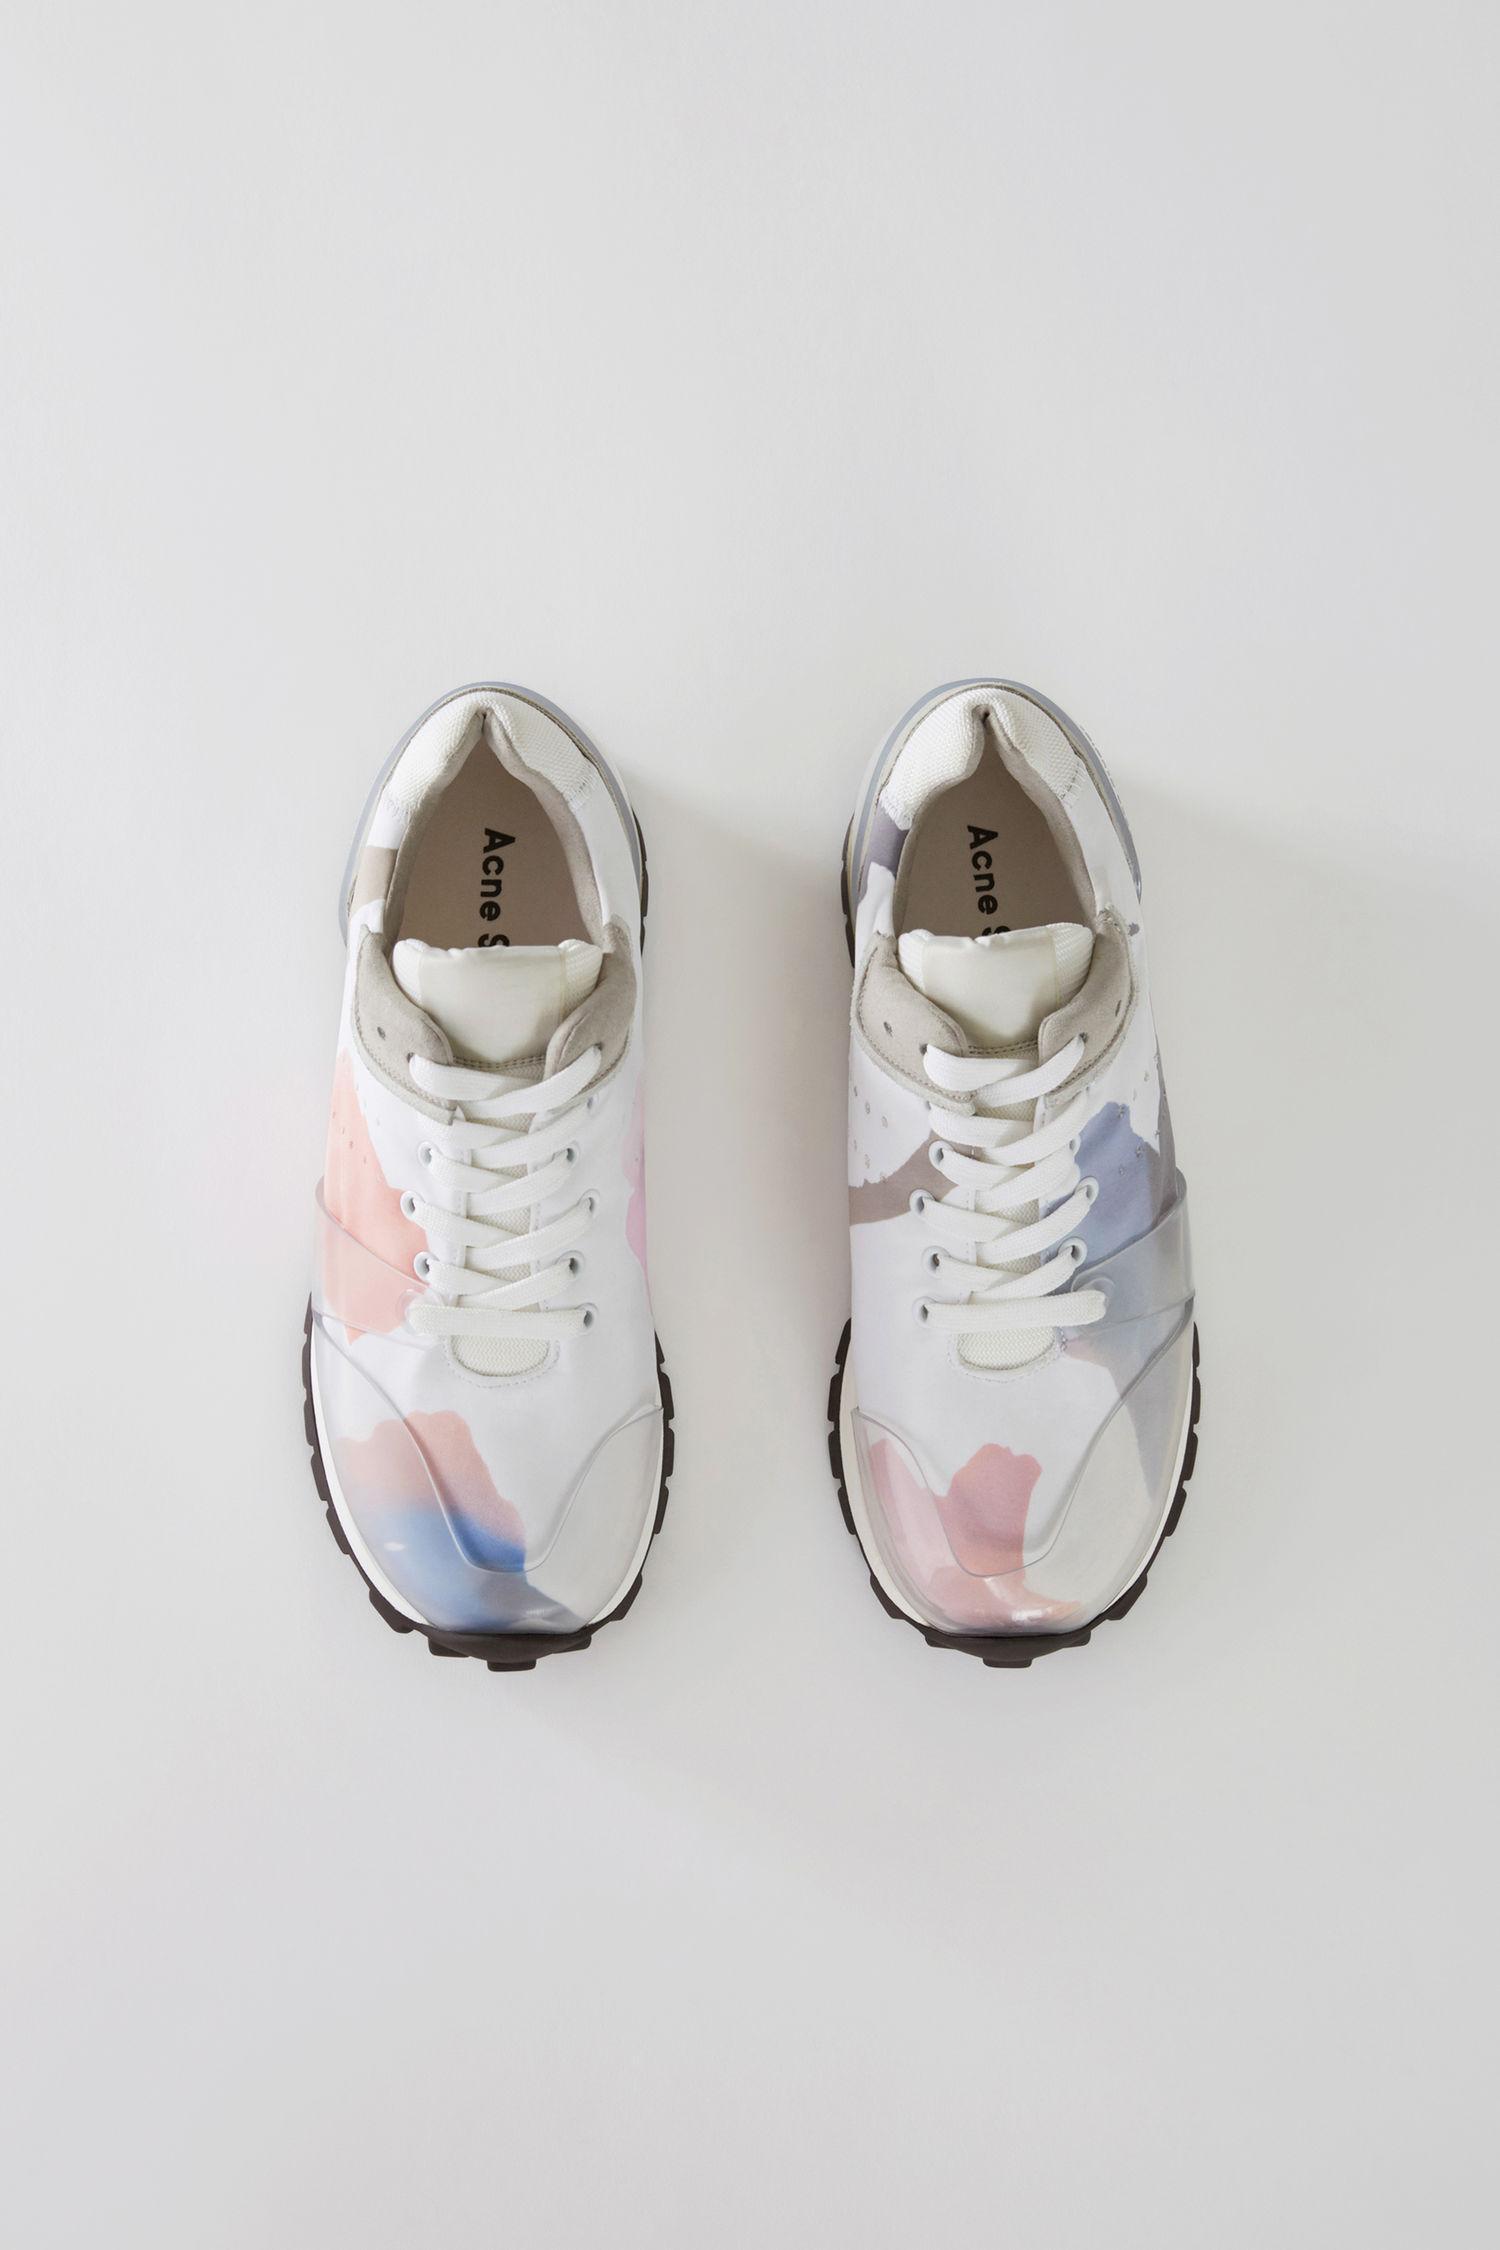 2462ebf99 Acne Studios Joriko Flower Print Sneakers In Flower Print Nylon In White  Multi